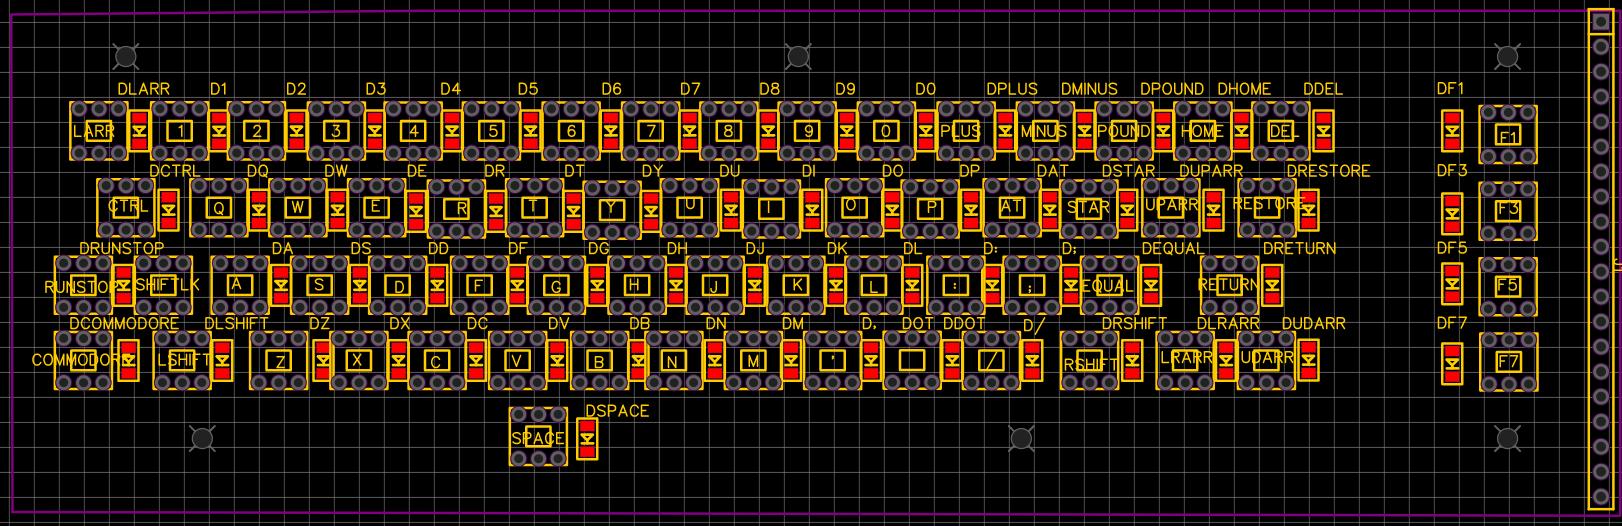 Thru Hole Keyboard PCB - First spin